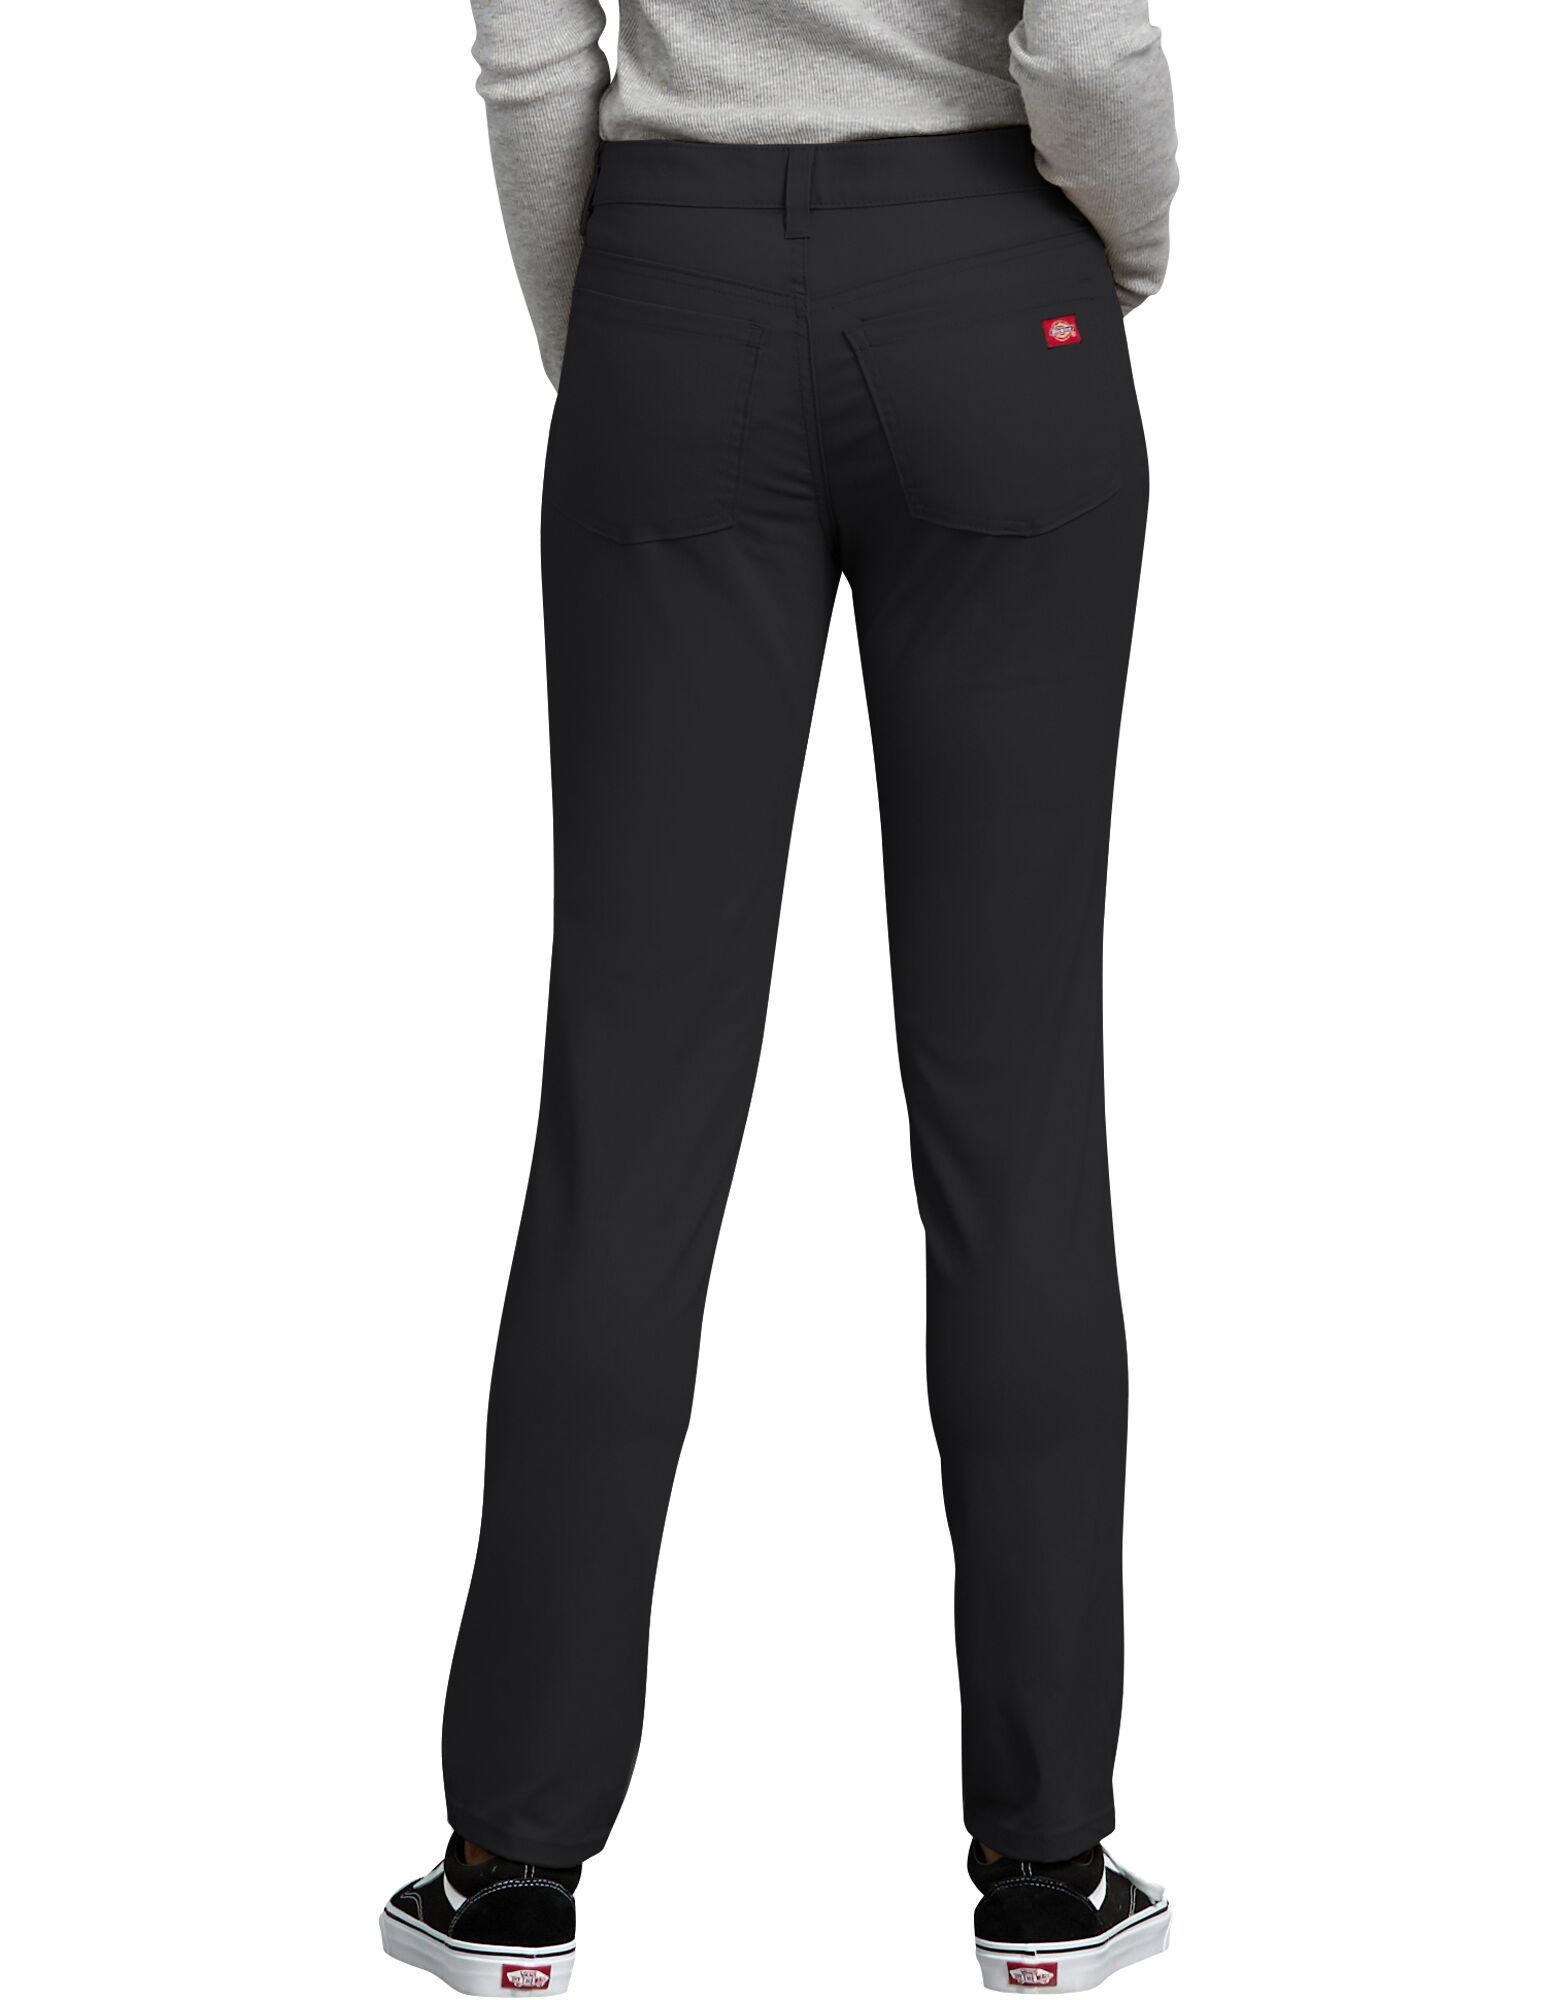 Skinny Leg Khaki Pants For Women